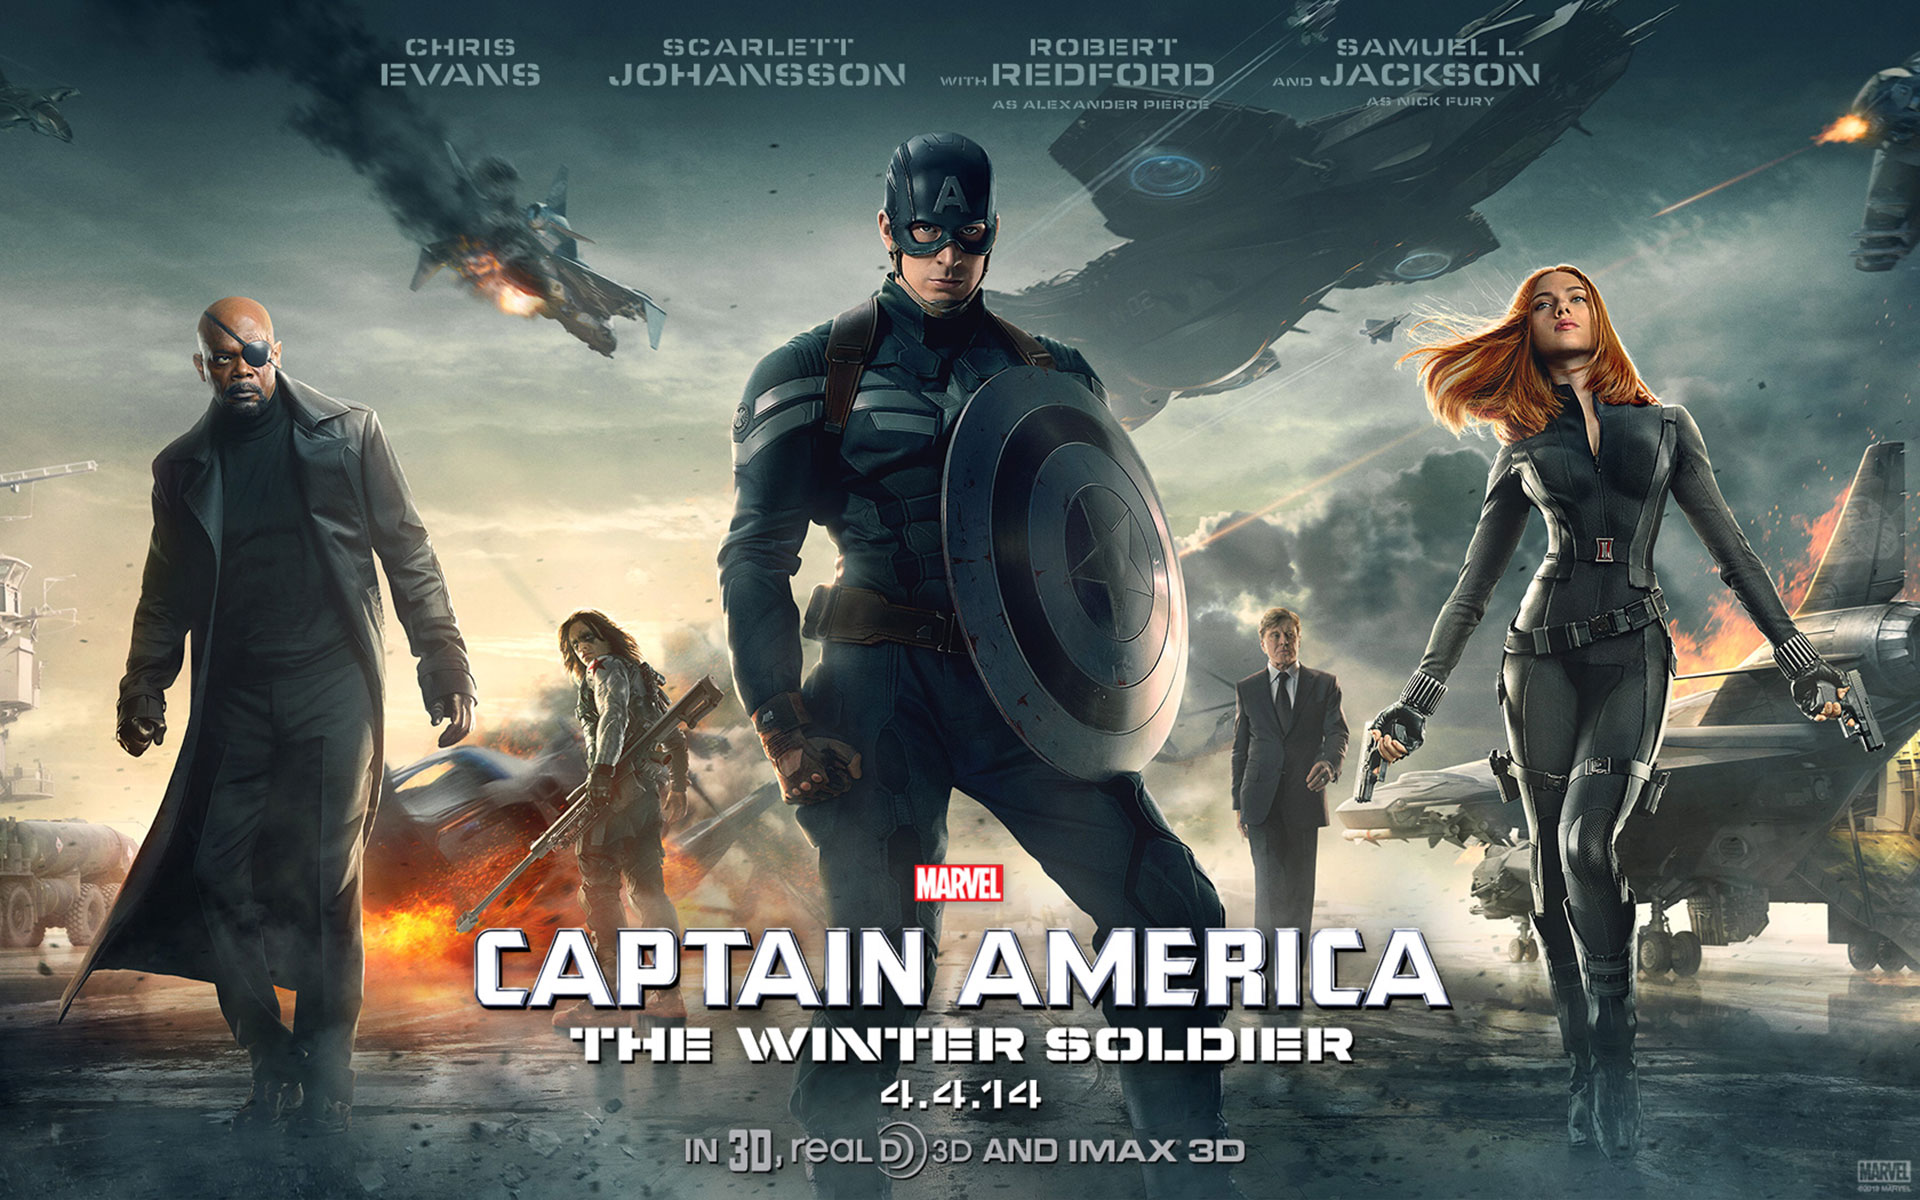 https://i2.wp.com/www.designbolts.com/wp-content/uploads/2014/03/Captain-America-The-Winter-Soldier-HD-Wallpaper1.jpg